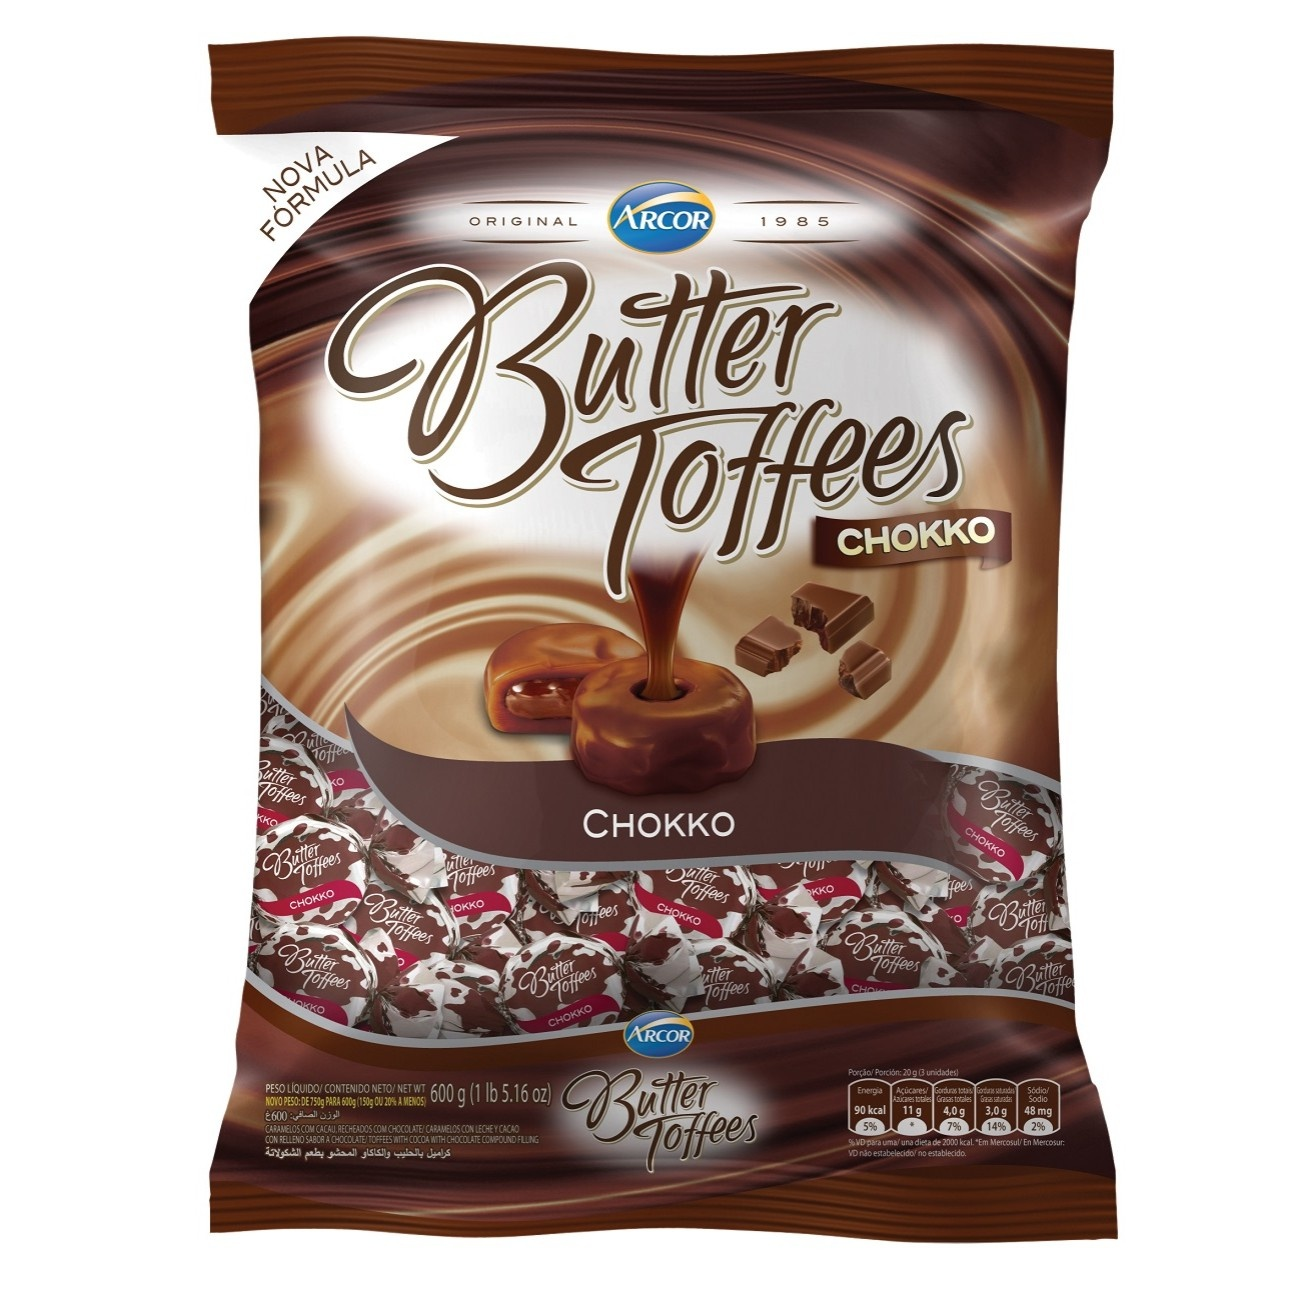 Bolsa de Bala Butter Toffes Chokko Choco 600g (92 un/cada)